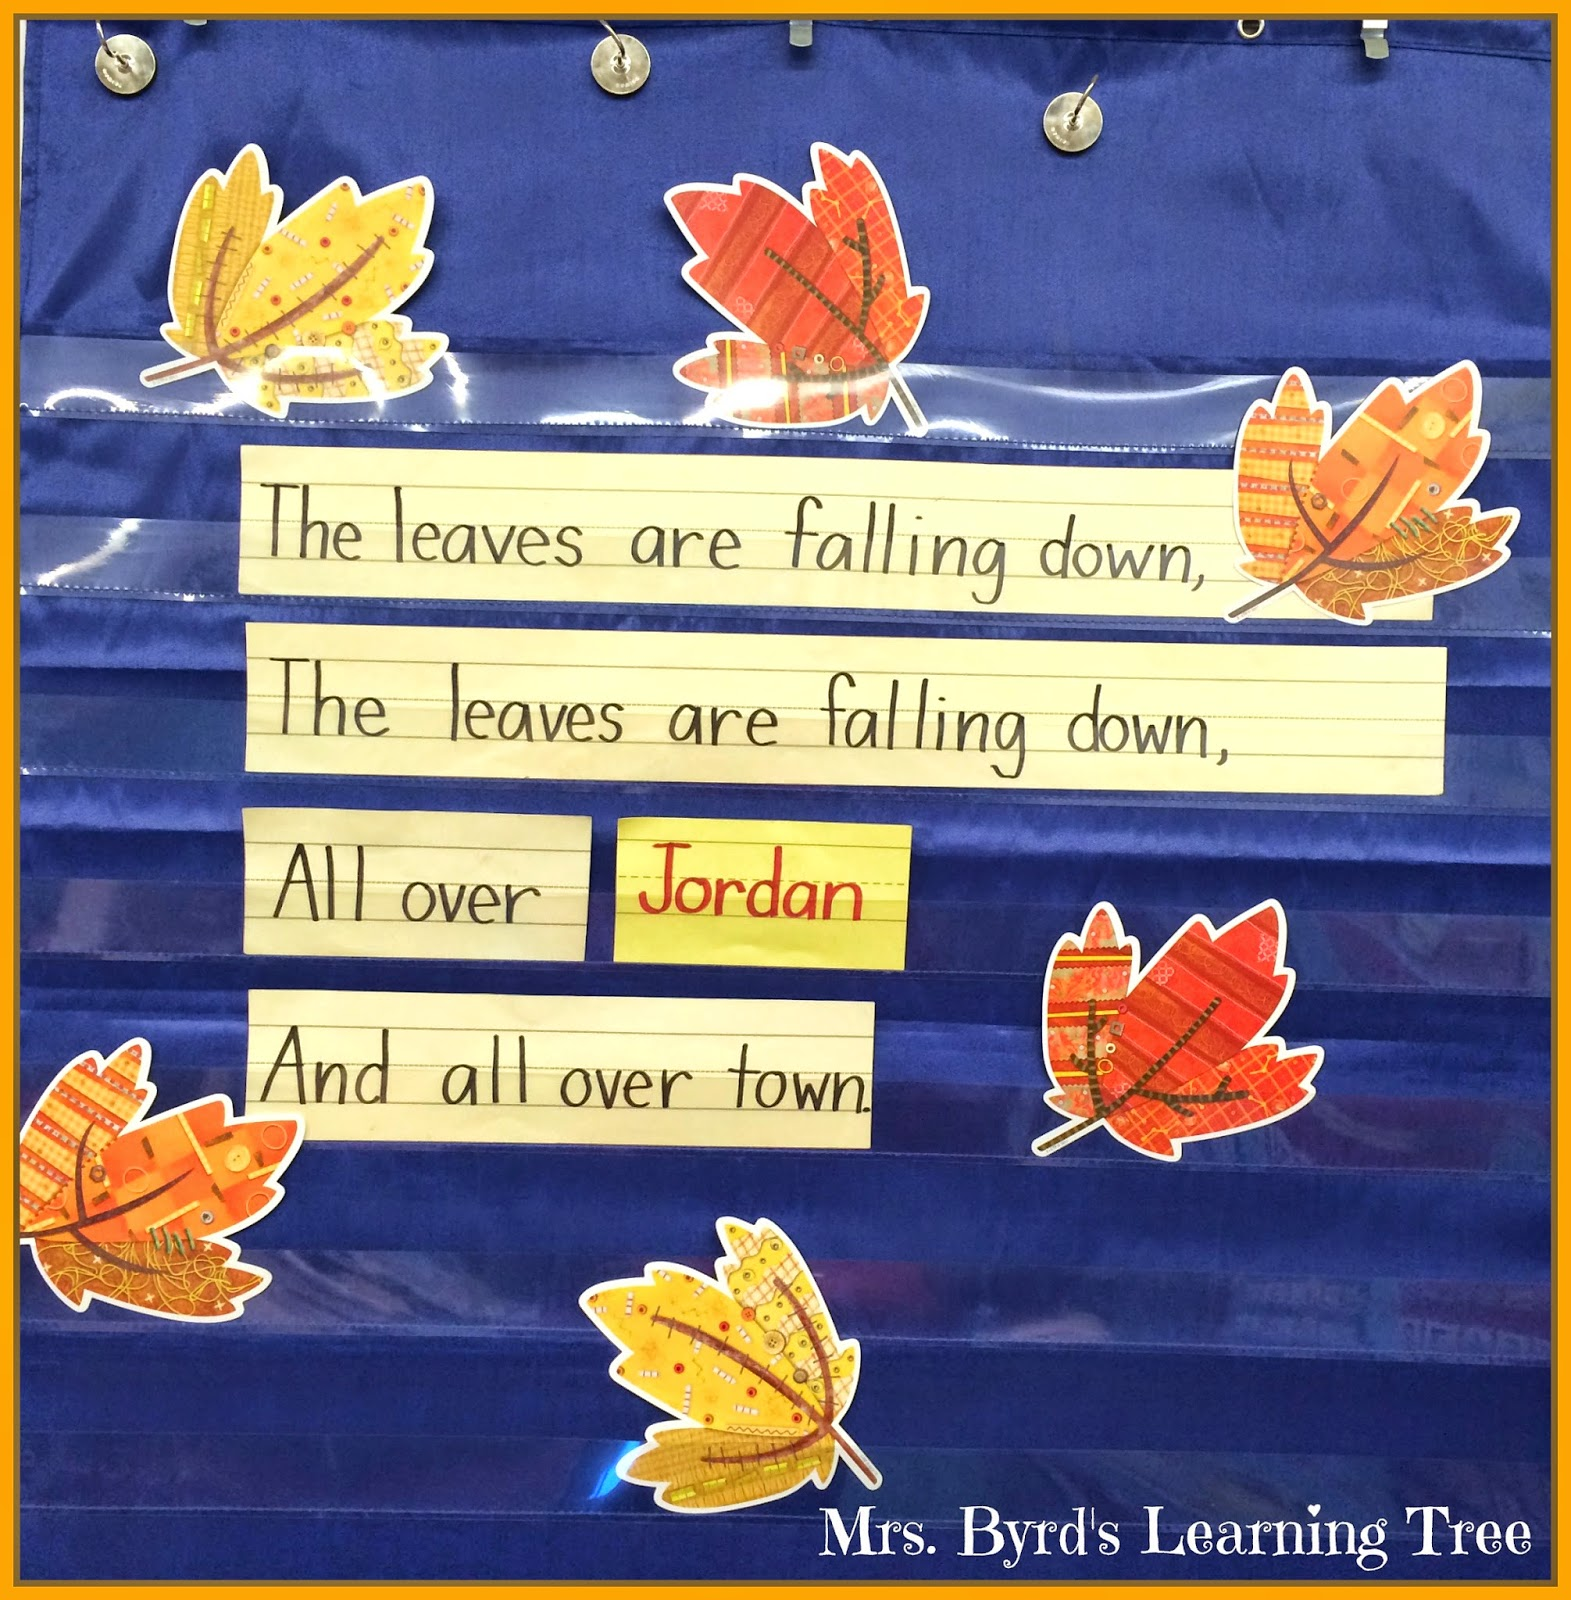 Mrs. Byrd's Learning Tree: Fall Fun!